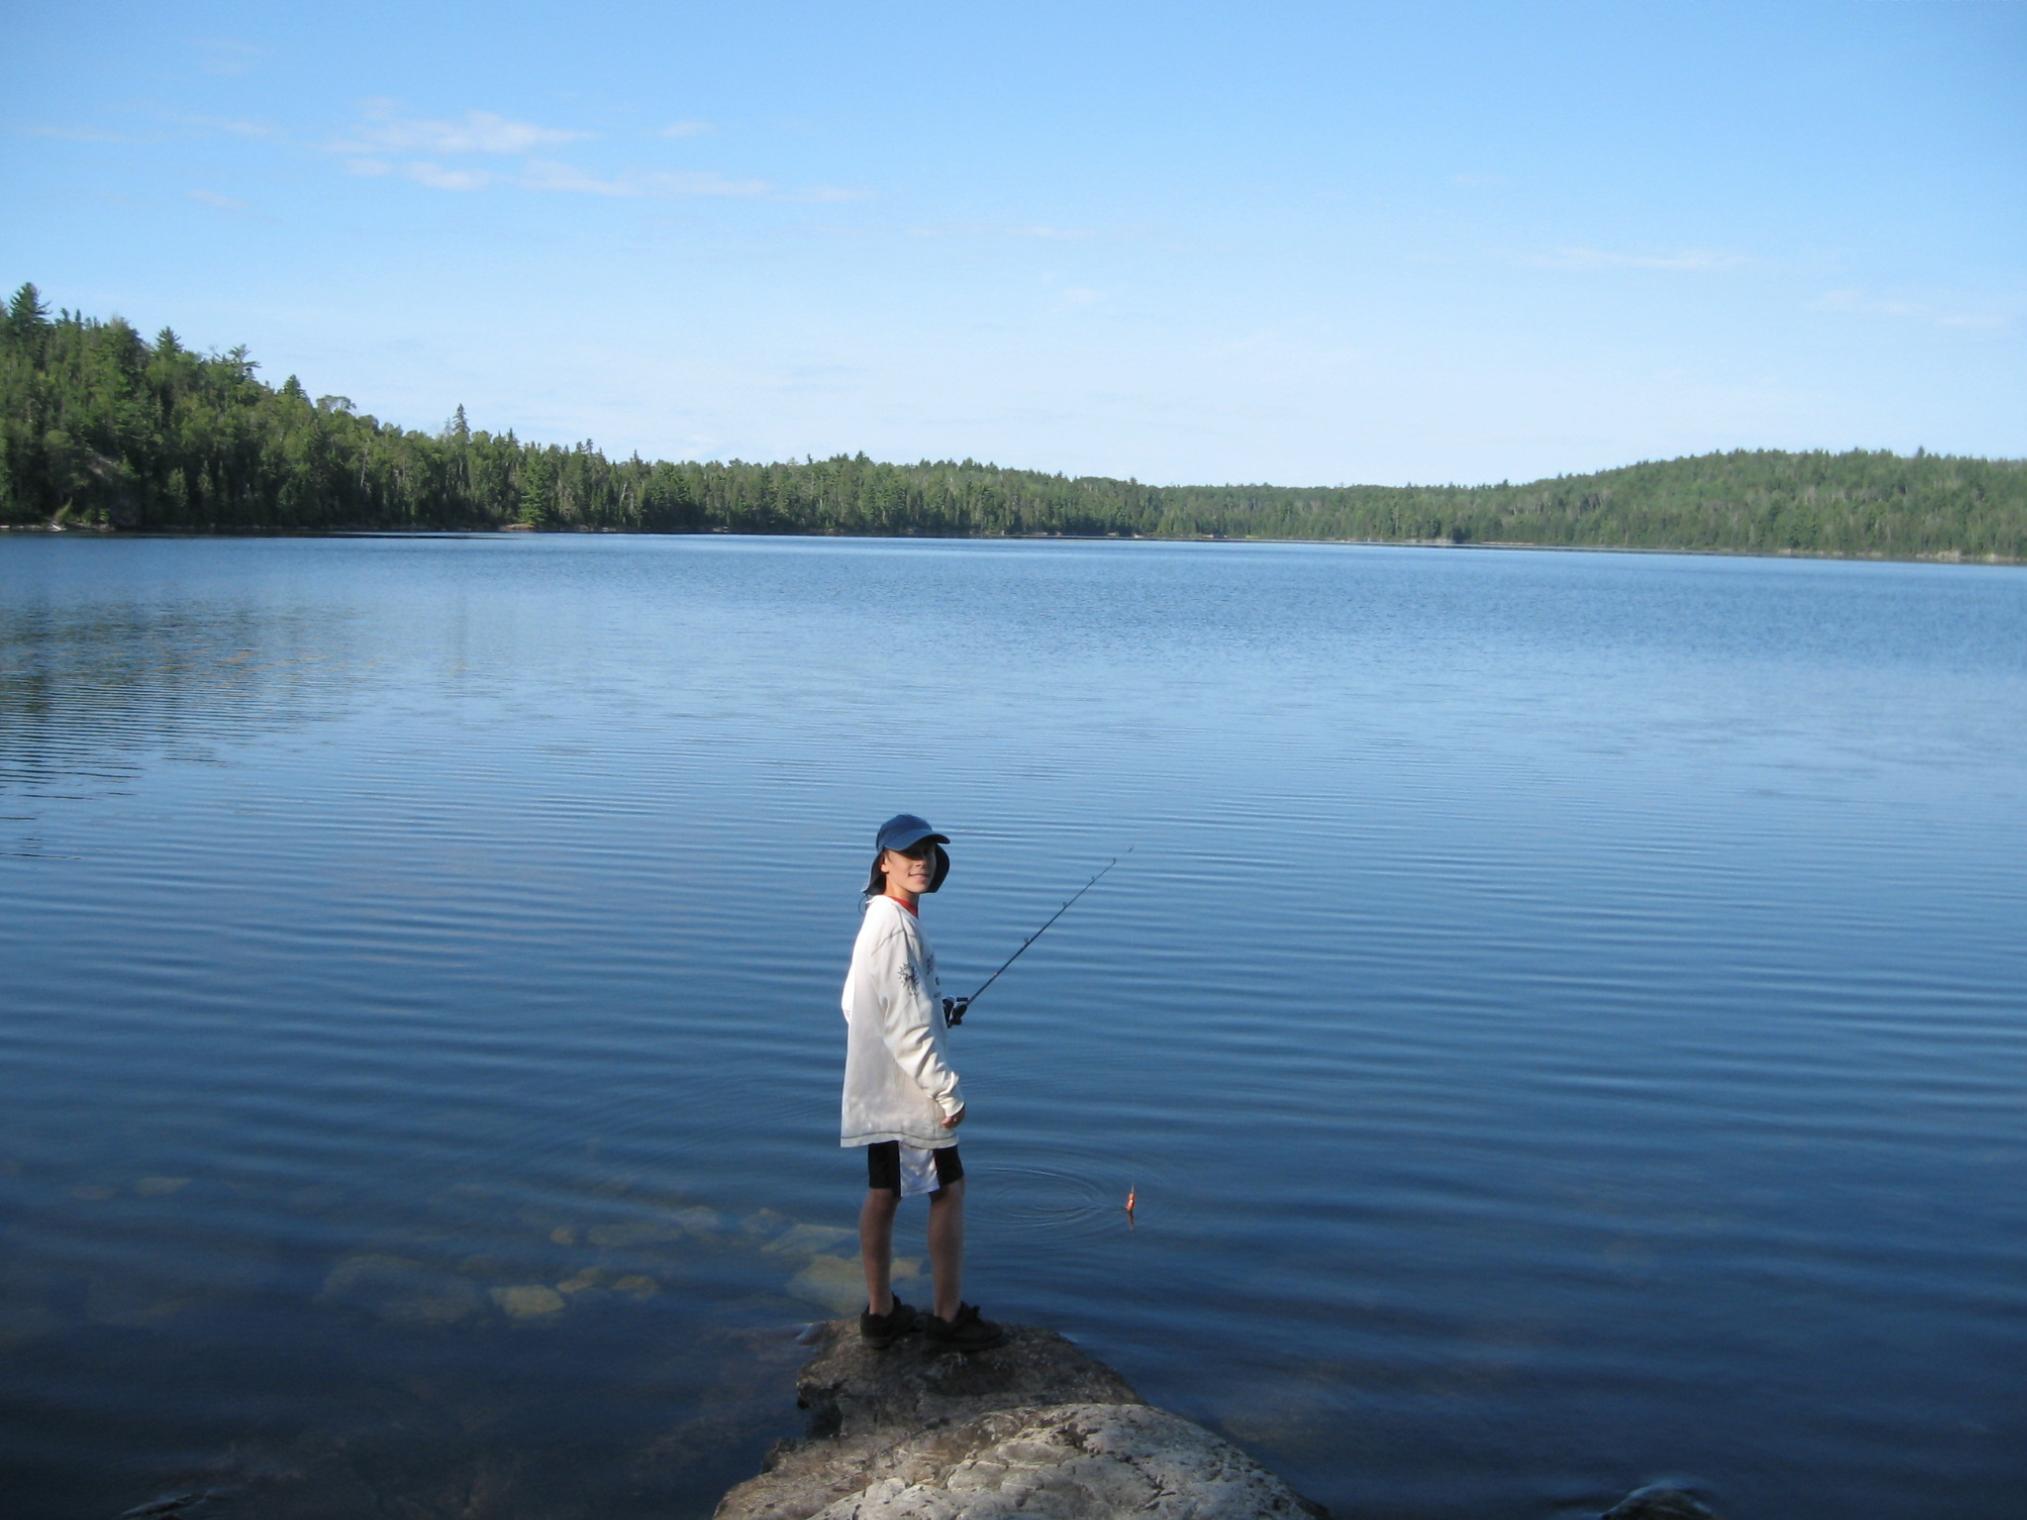 Sean casting off shore